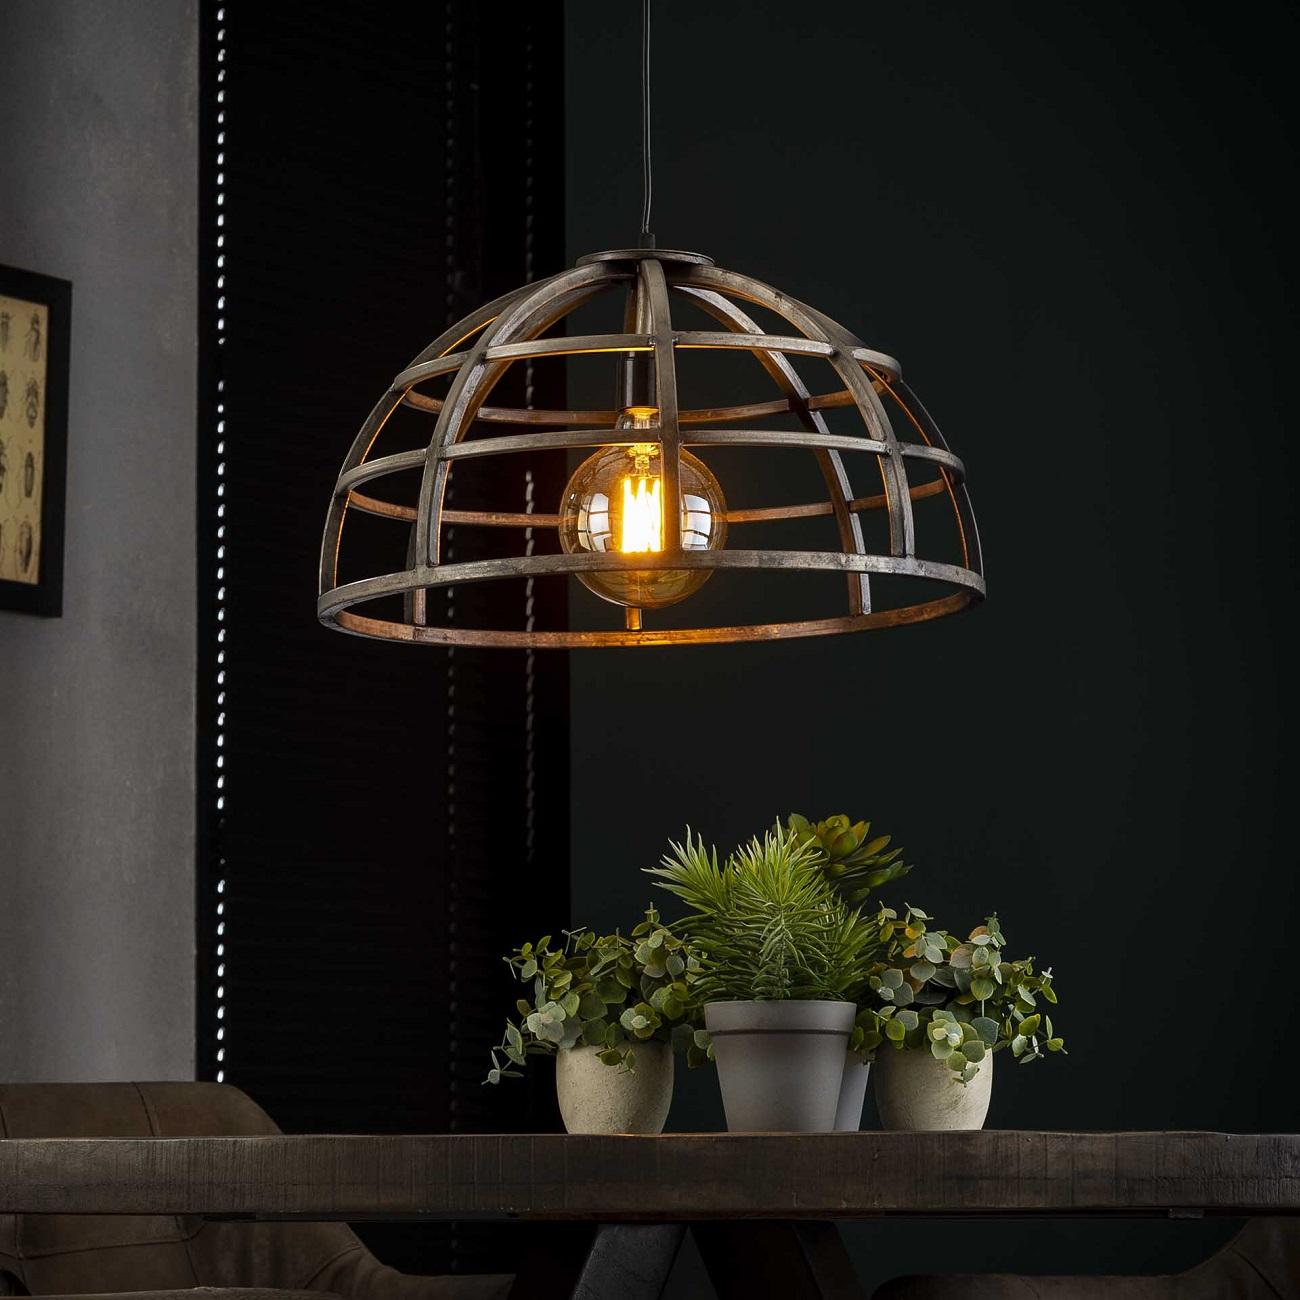 Hanglamp Dome 1xØ50 in Oud zilver   Zaloni